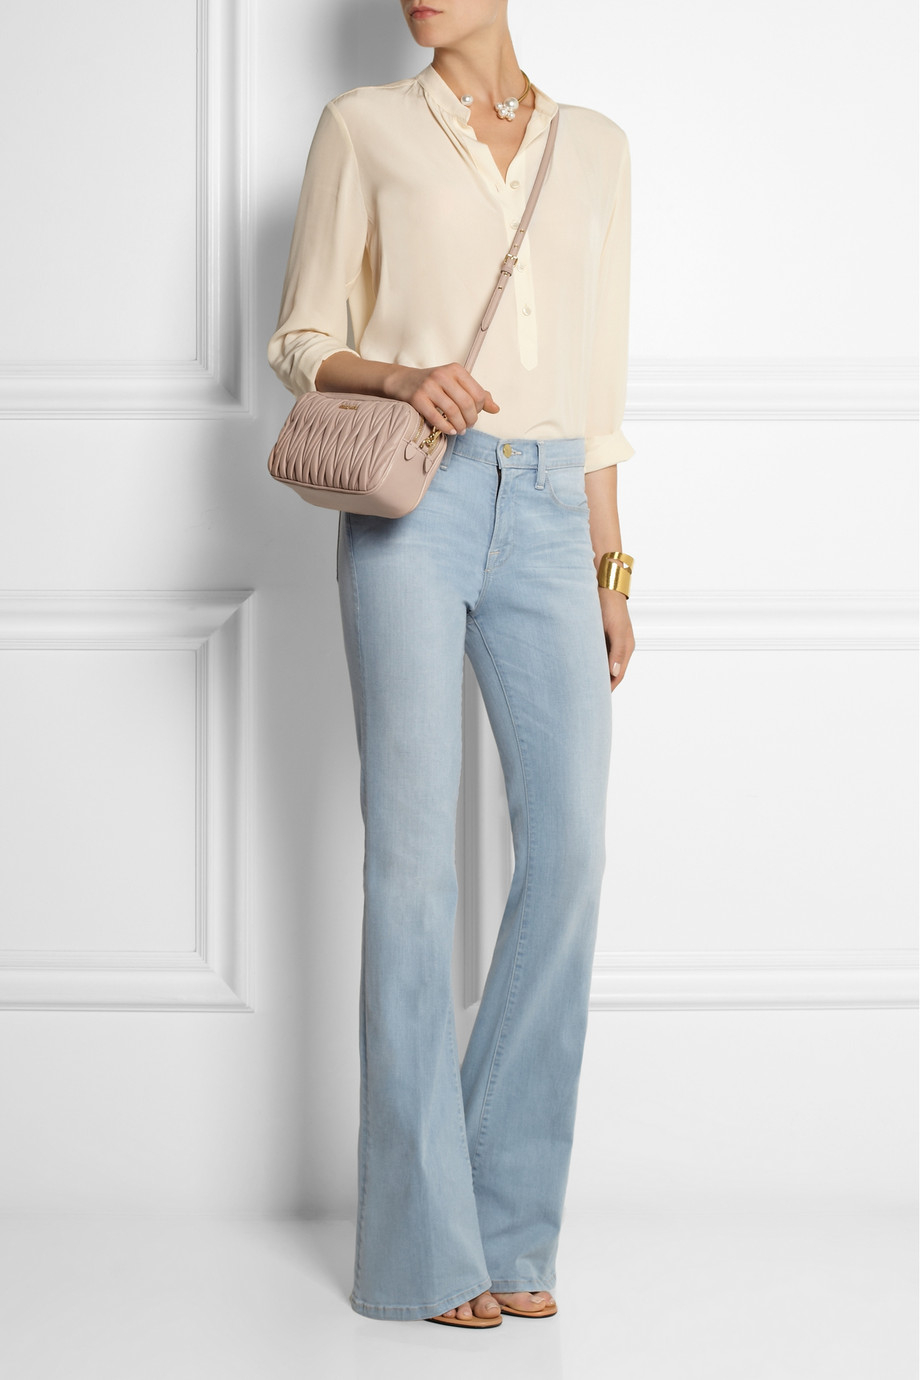 04398cb27cac Lyst - Miu Miu Matelassé Leather Shoulder Bag in Natural